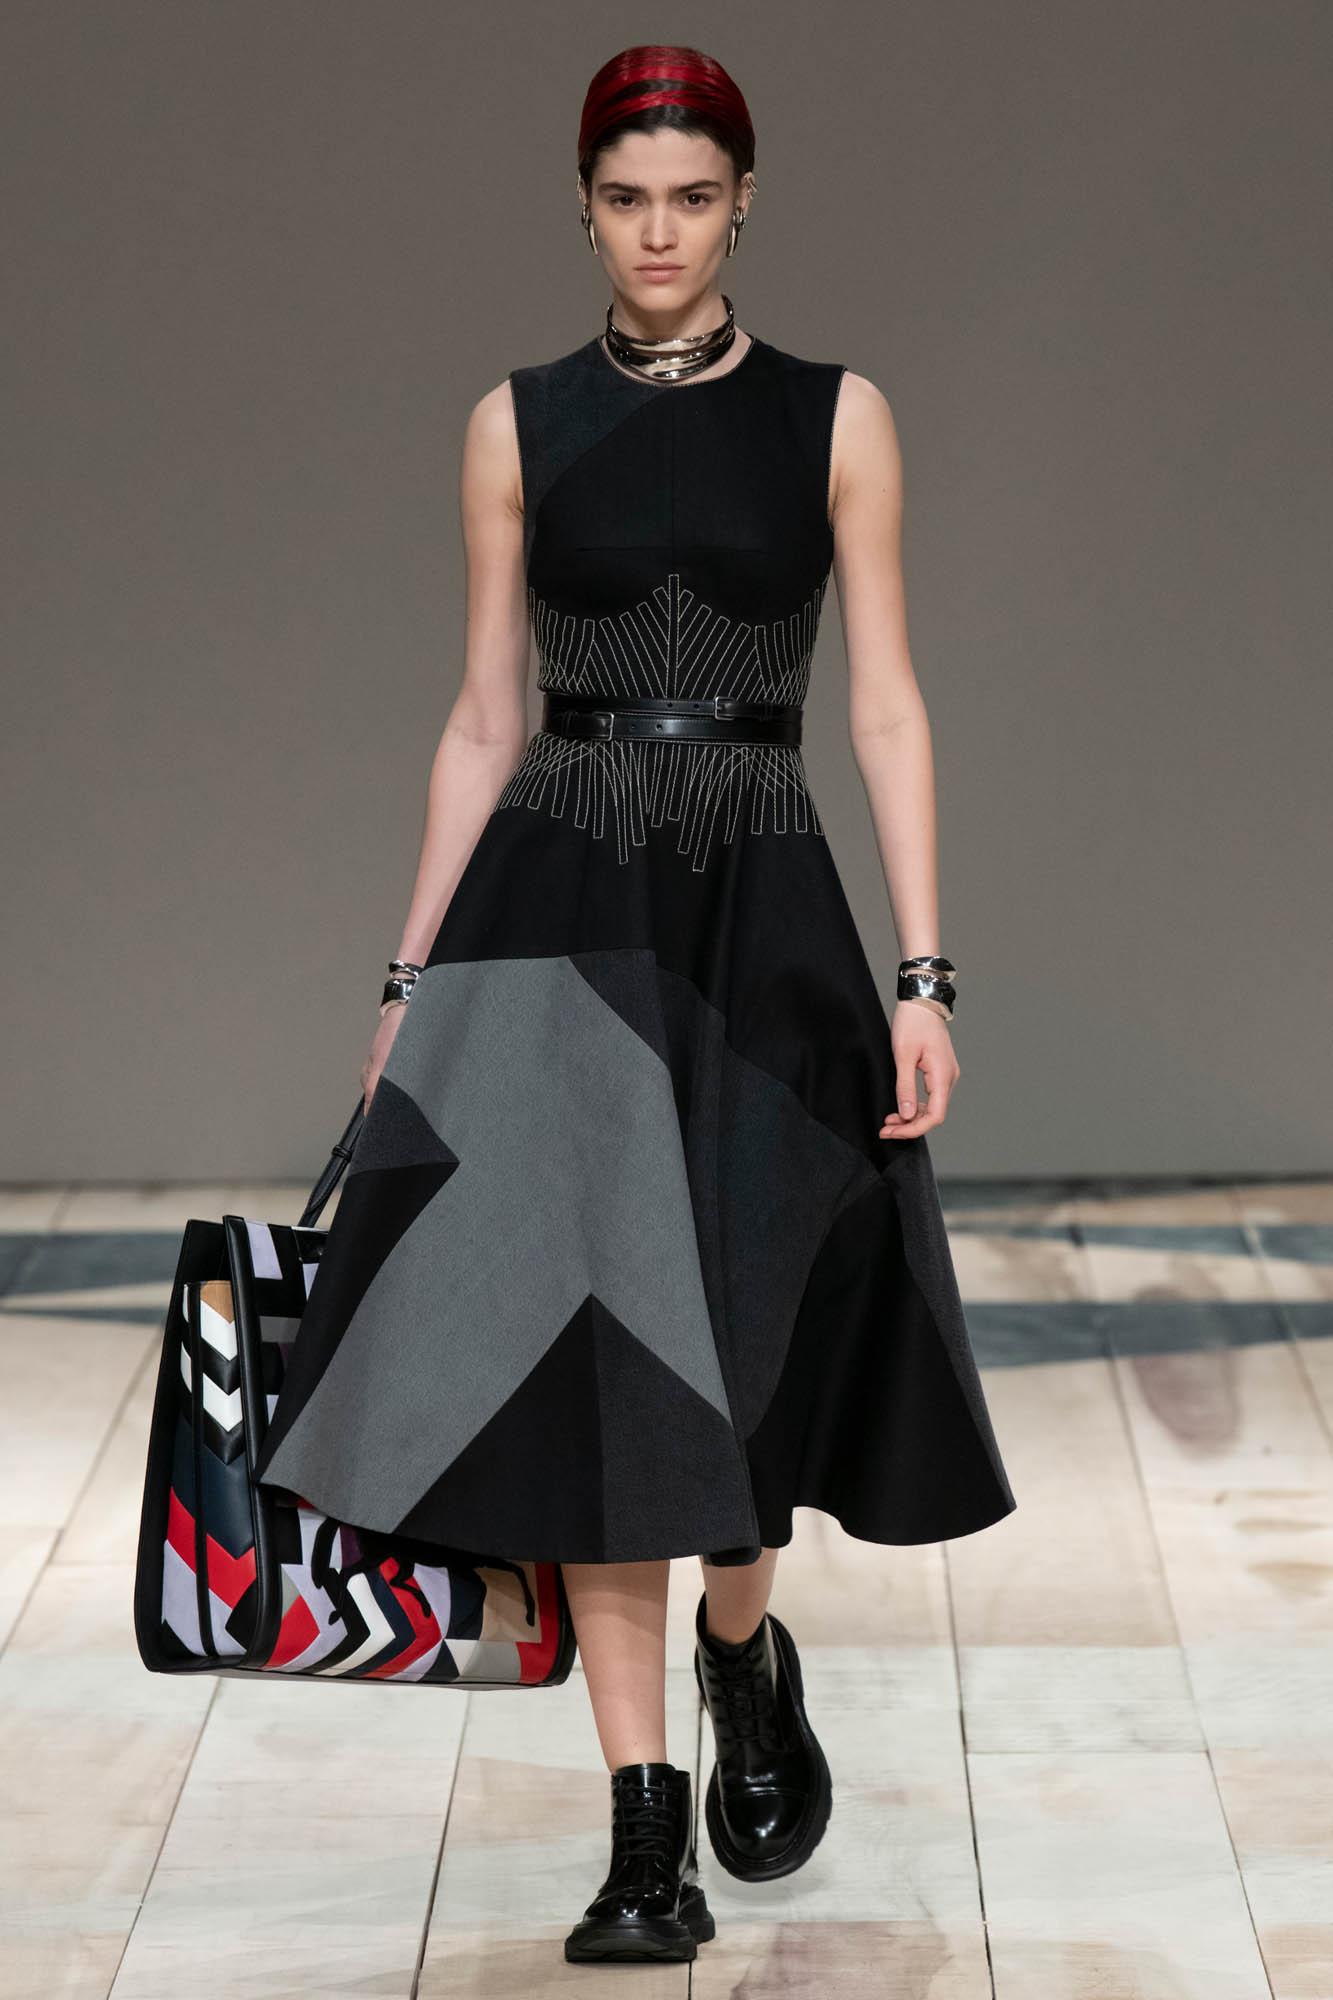 Alexander McQueen Womenswear